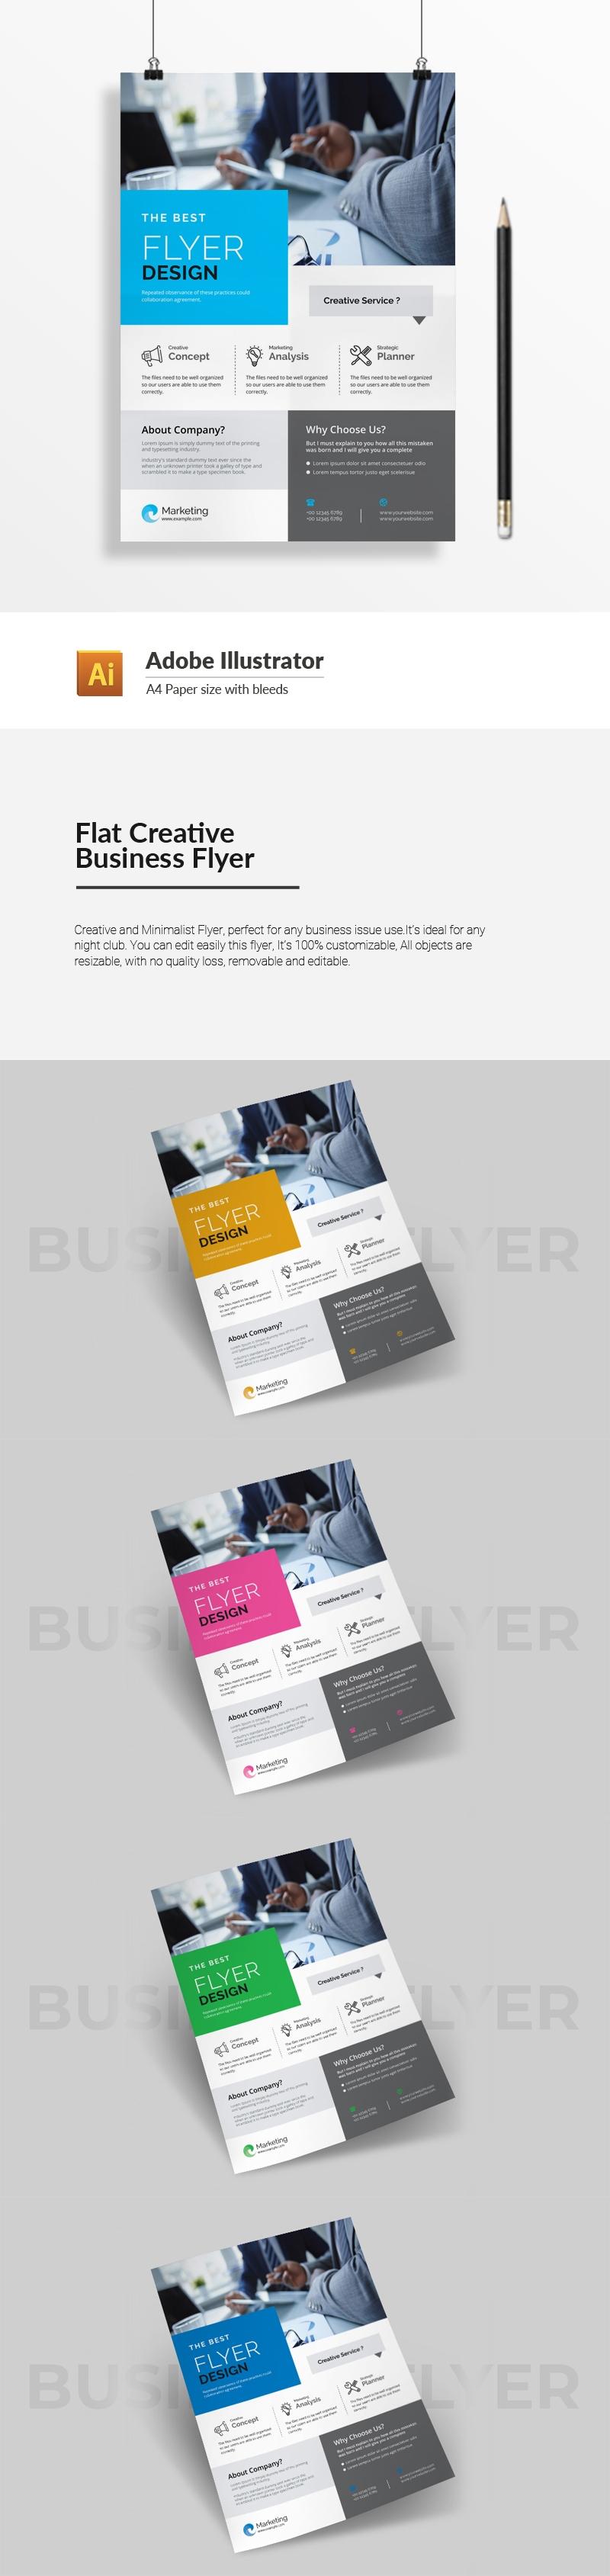 Flat Creative Business Flyer